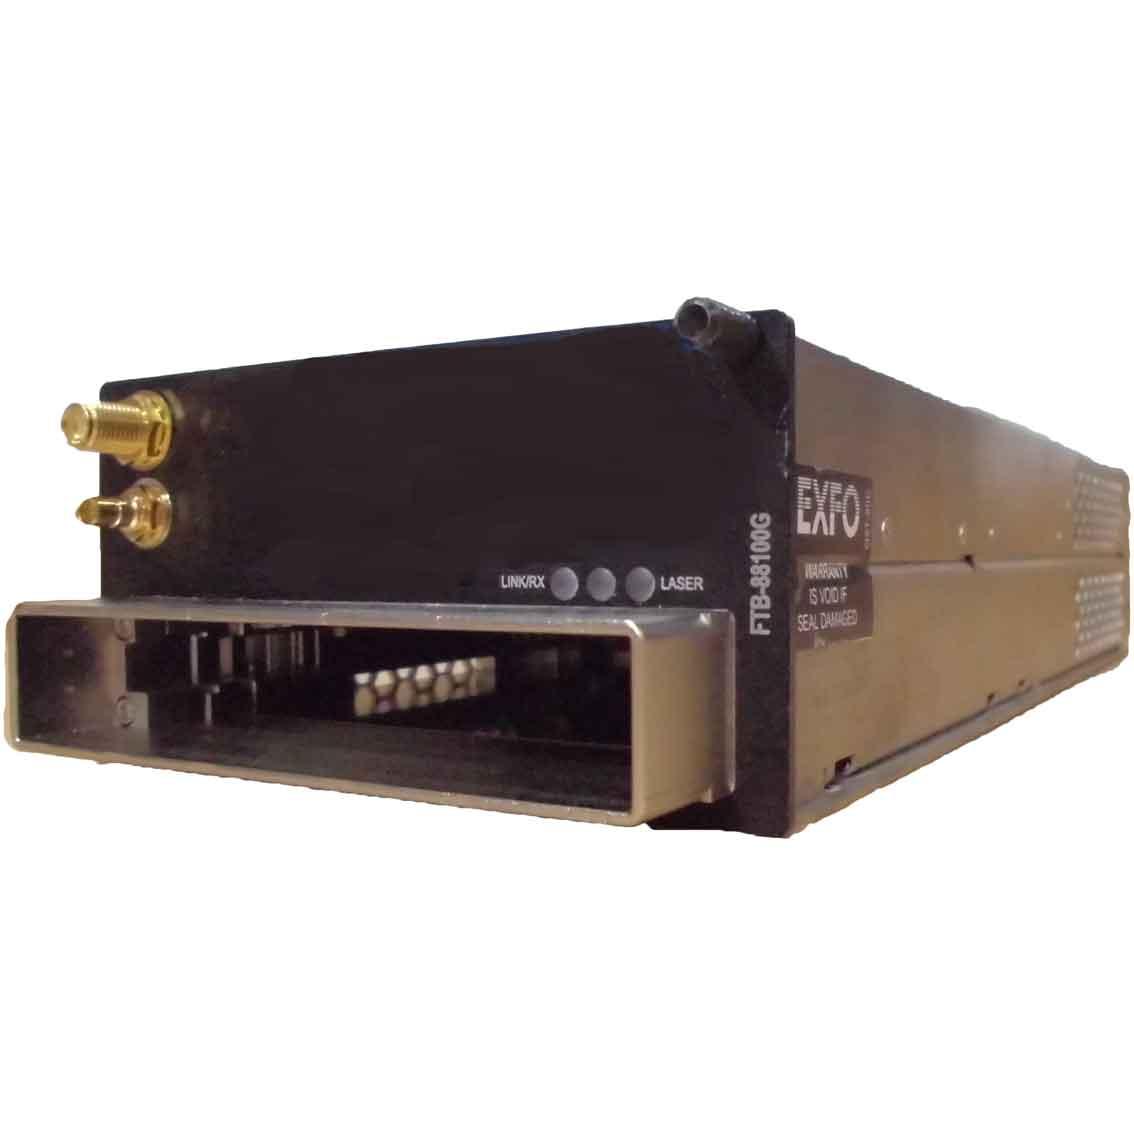 FTB-88100G/100GE,OTU4,ADV-FILTERS,ETH-CAPTURE パワーブレイザーテストモジュール